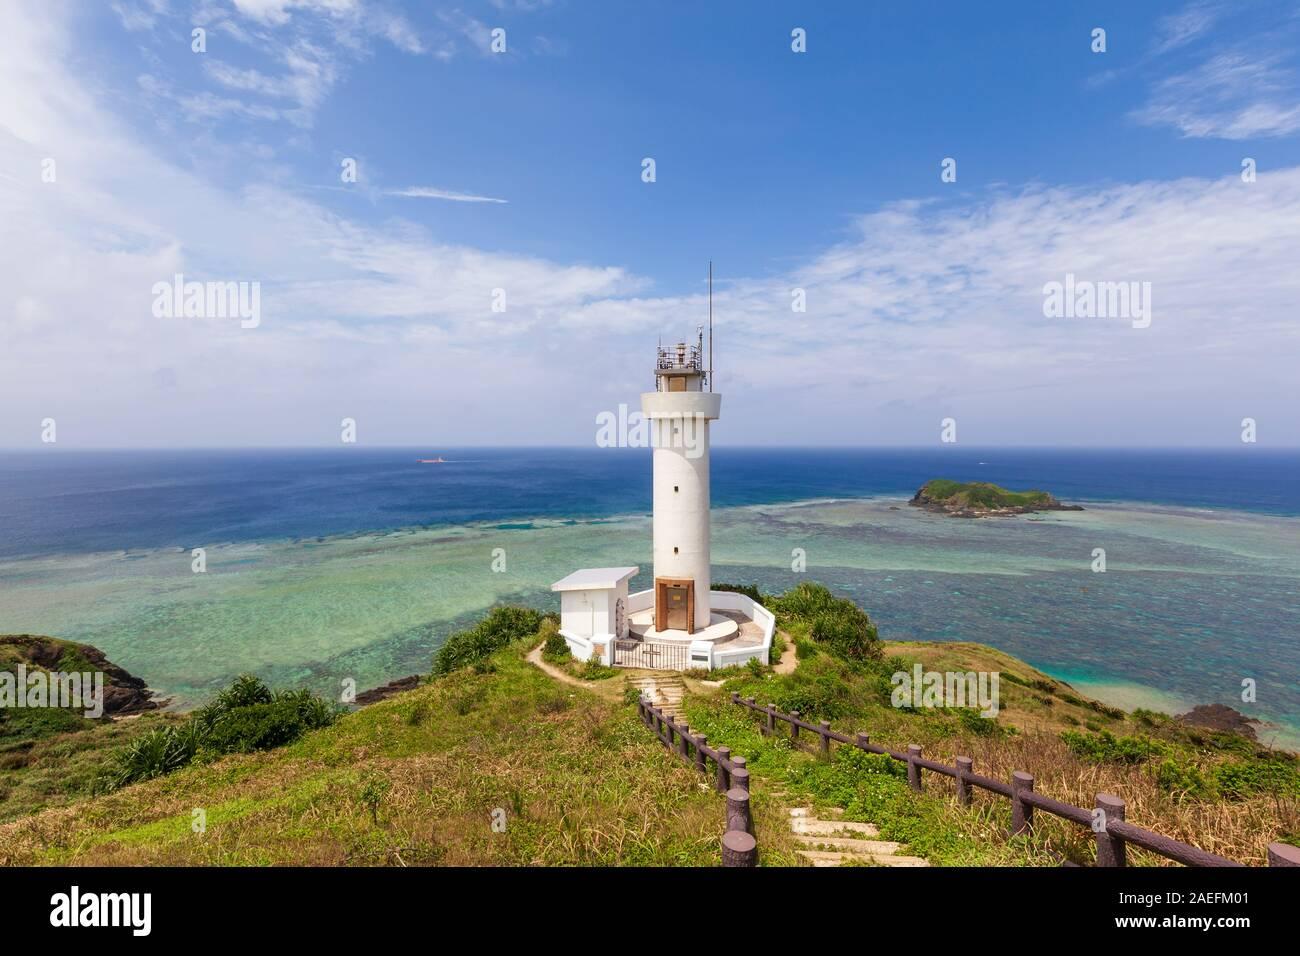 Hirakubo Leuchtturm auf der Insel Ishigaki in der Präfektur Okinawa, Japan. Stockfoto